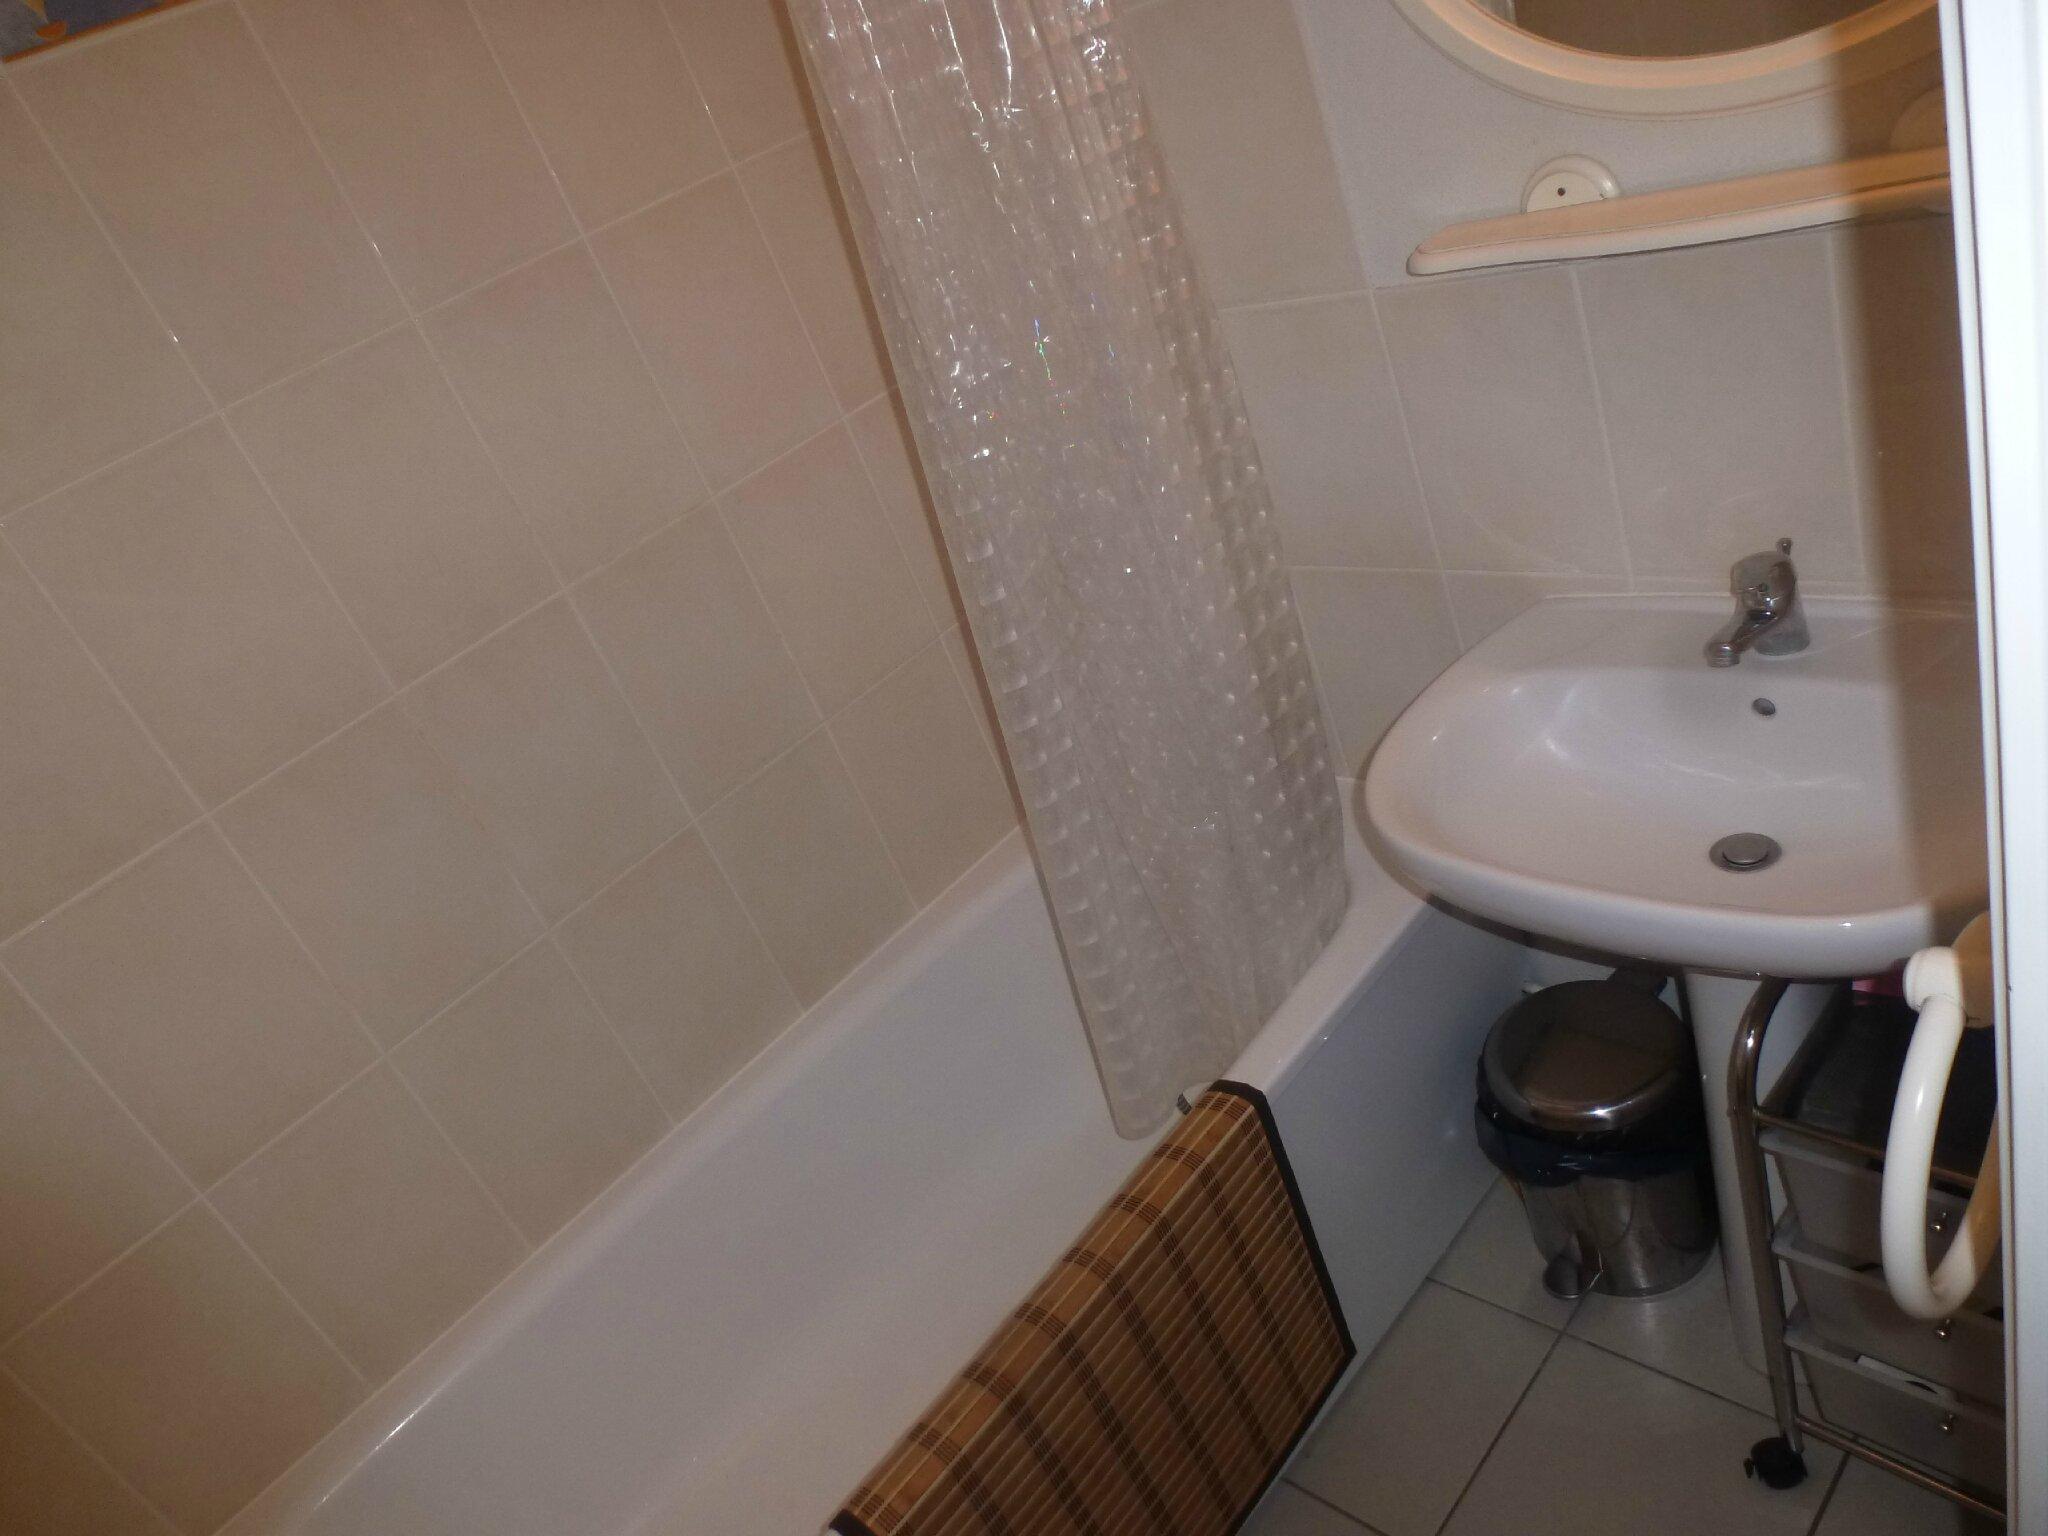 sallede bain